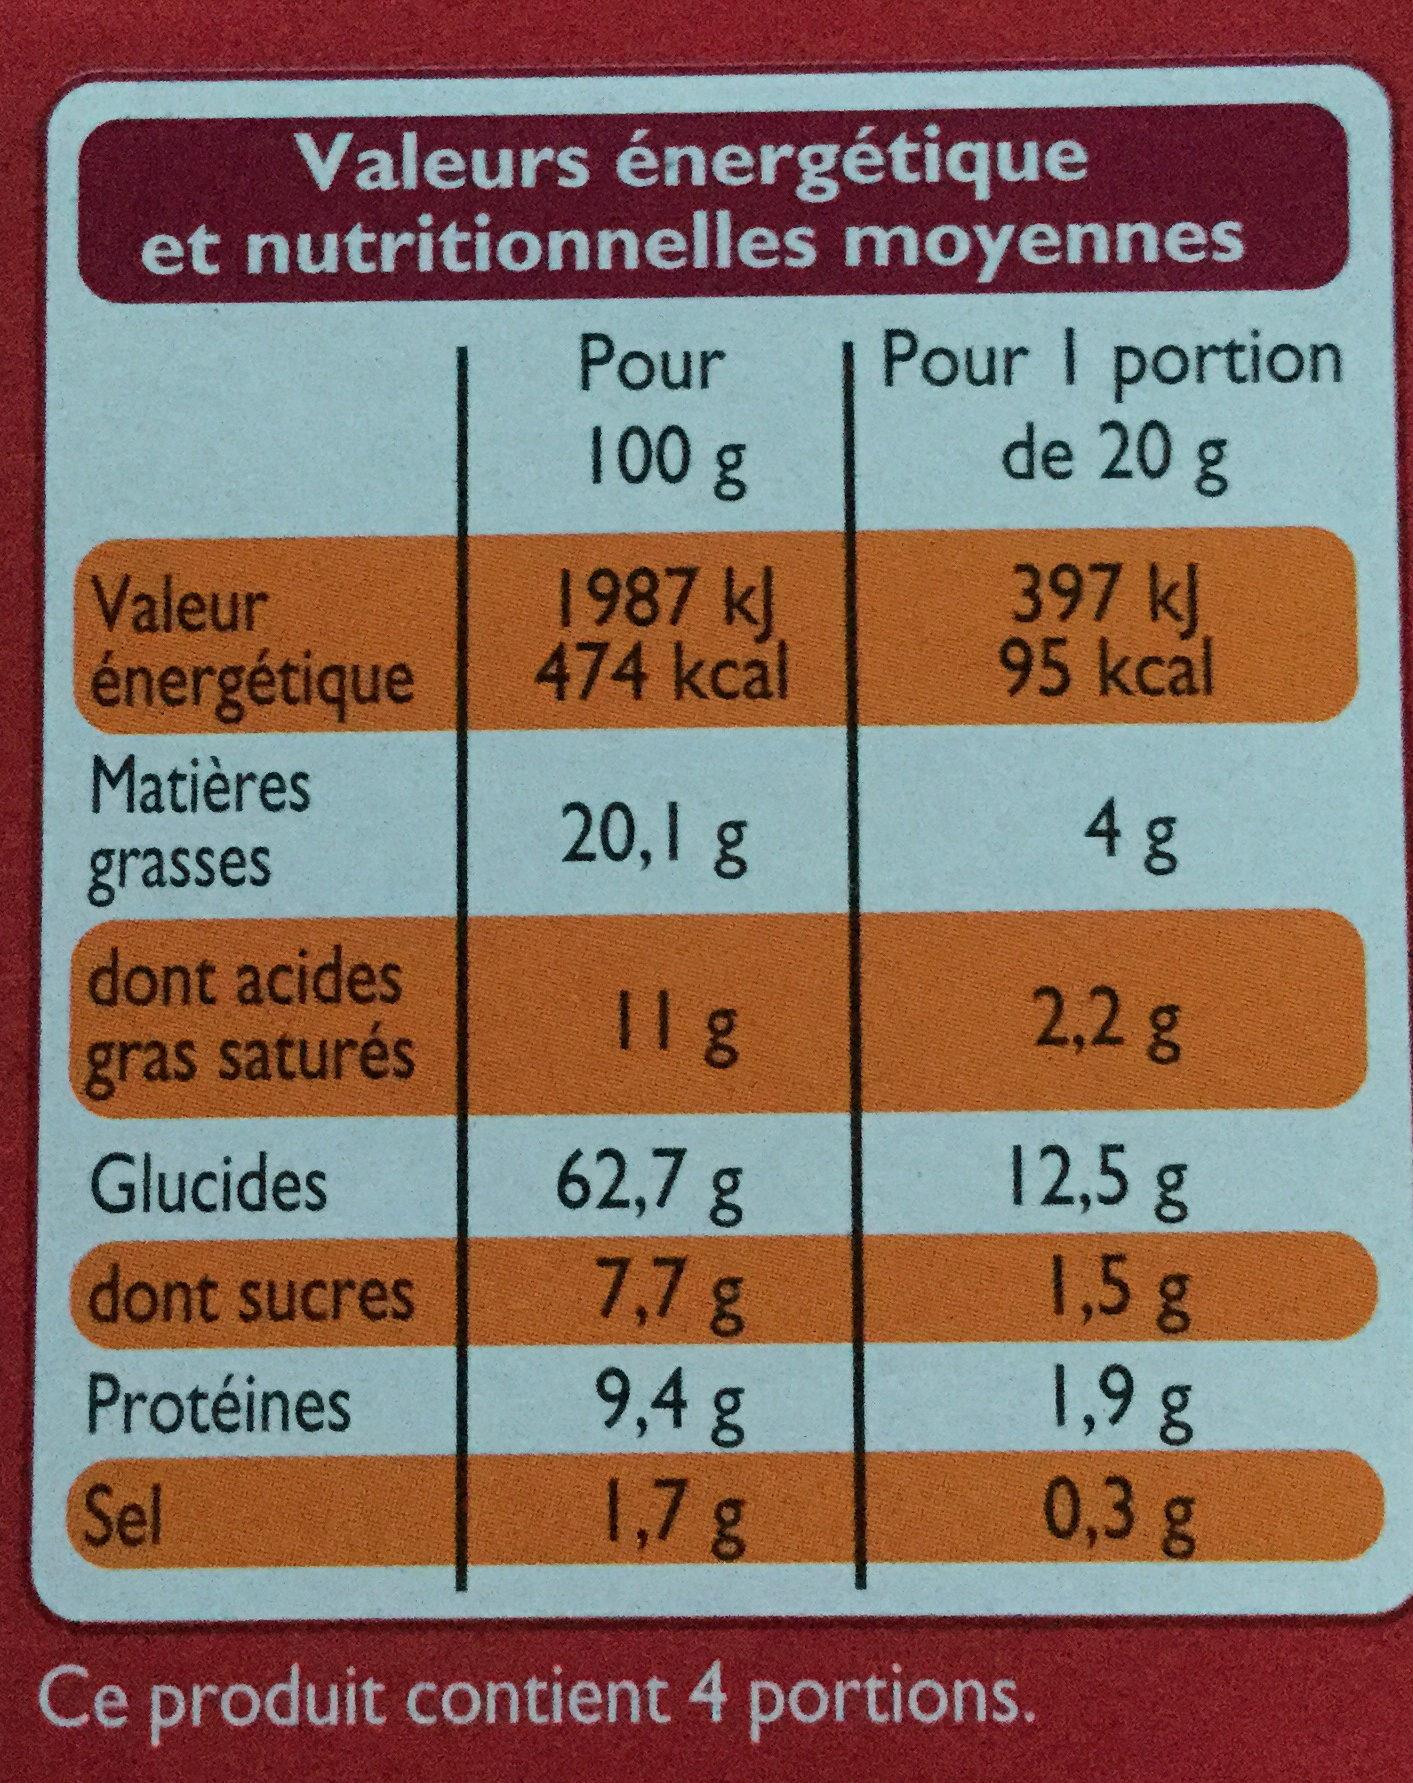 Étincelles - Biscuits saveur sweet chili - Valori nutrizionali - fr